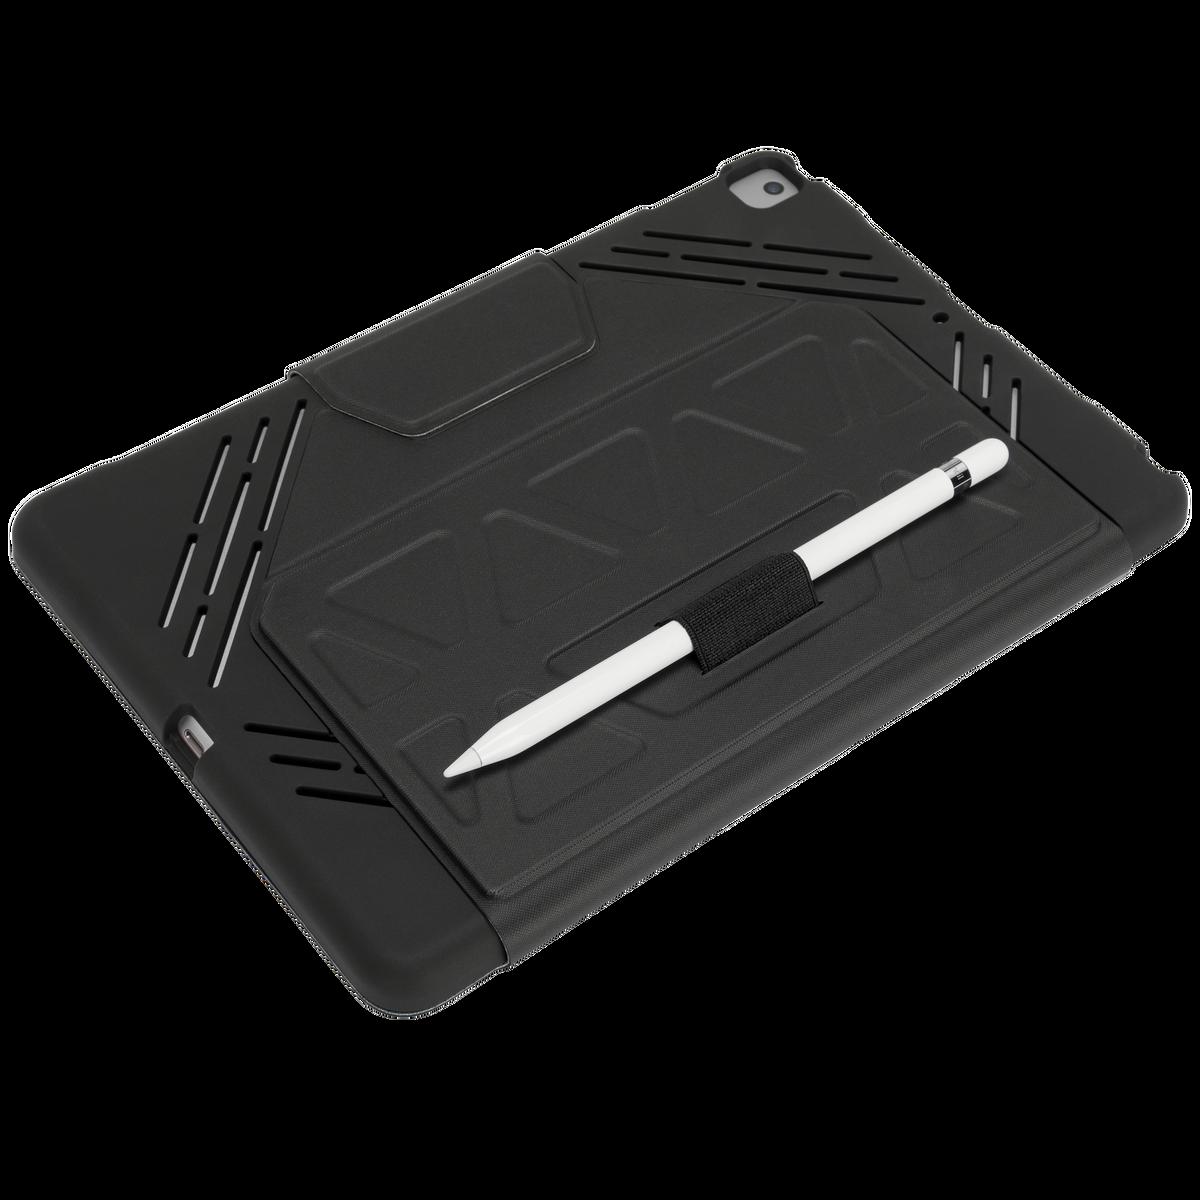 Targus: Pro-Tek case for iPad (7th Gen) 10.2-inch , iPad Air 10.5-inch and iPad Pro 10.5-inch - Black image